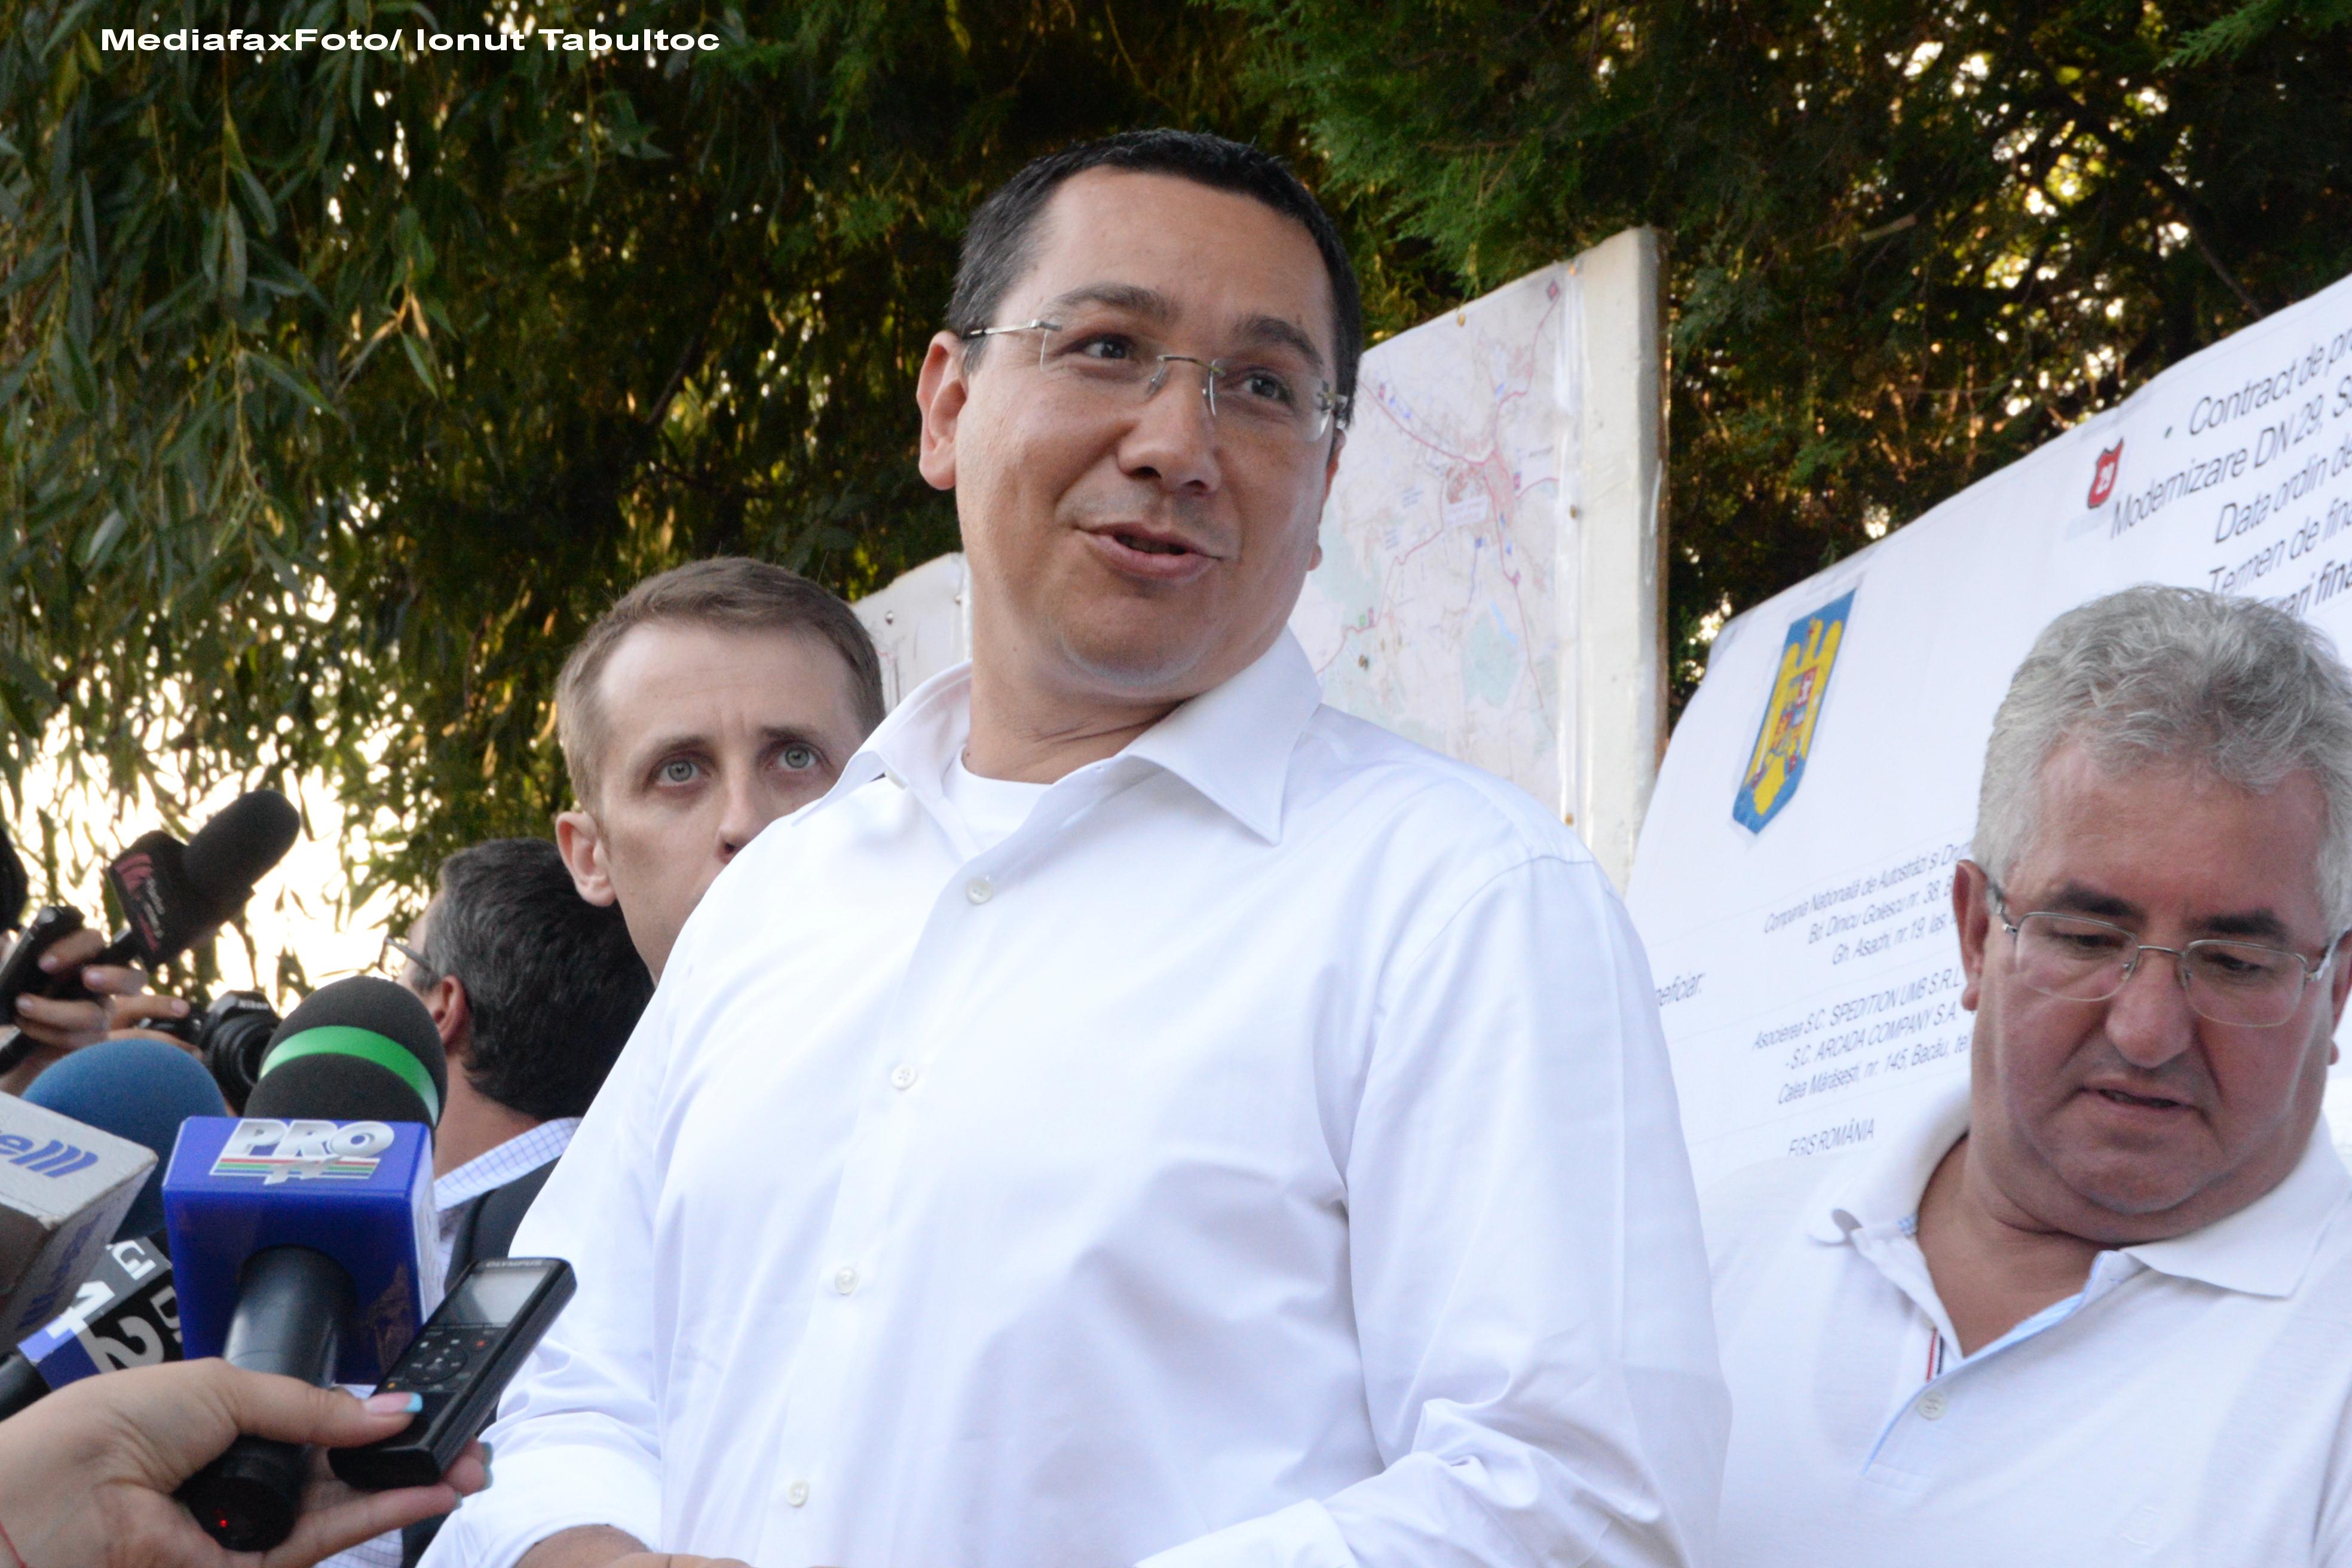 Victor Ponta: Monica Macovei a spus din greseala ca seamana cu Nelson Mandela, a vrut sa spuna Ana Pauker